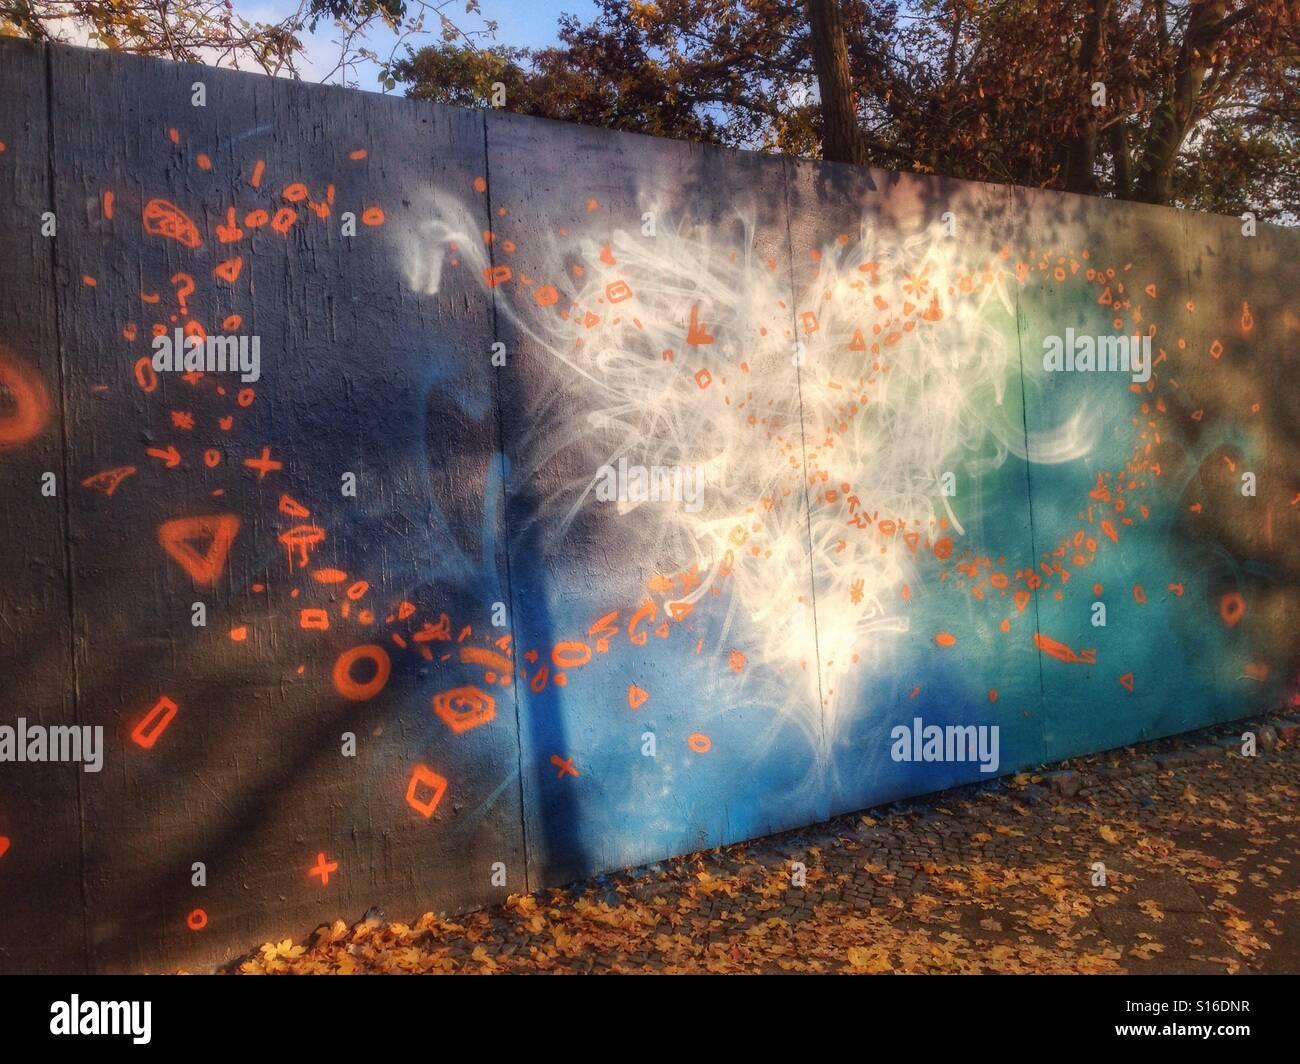 Graffiti endless stock photos graffiti endless stock images alamy - Eternity gran canaria ...